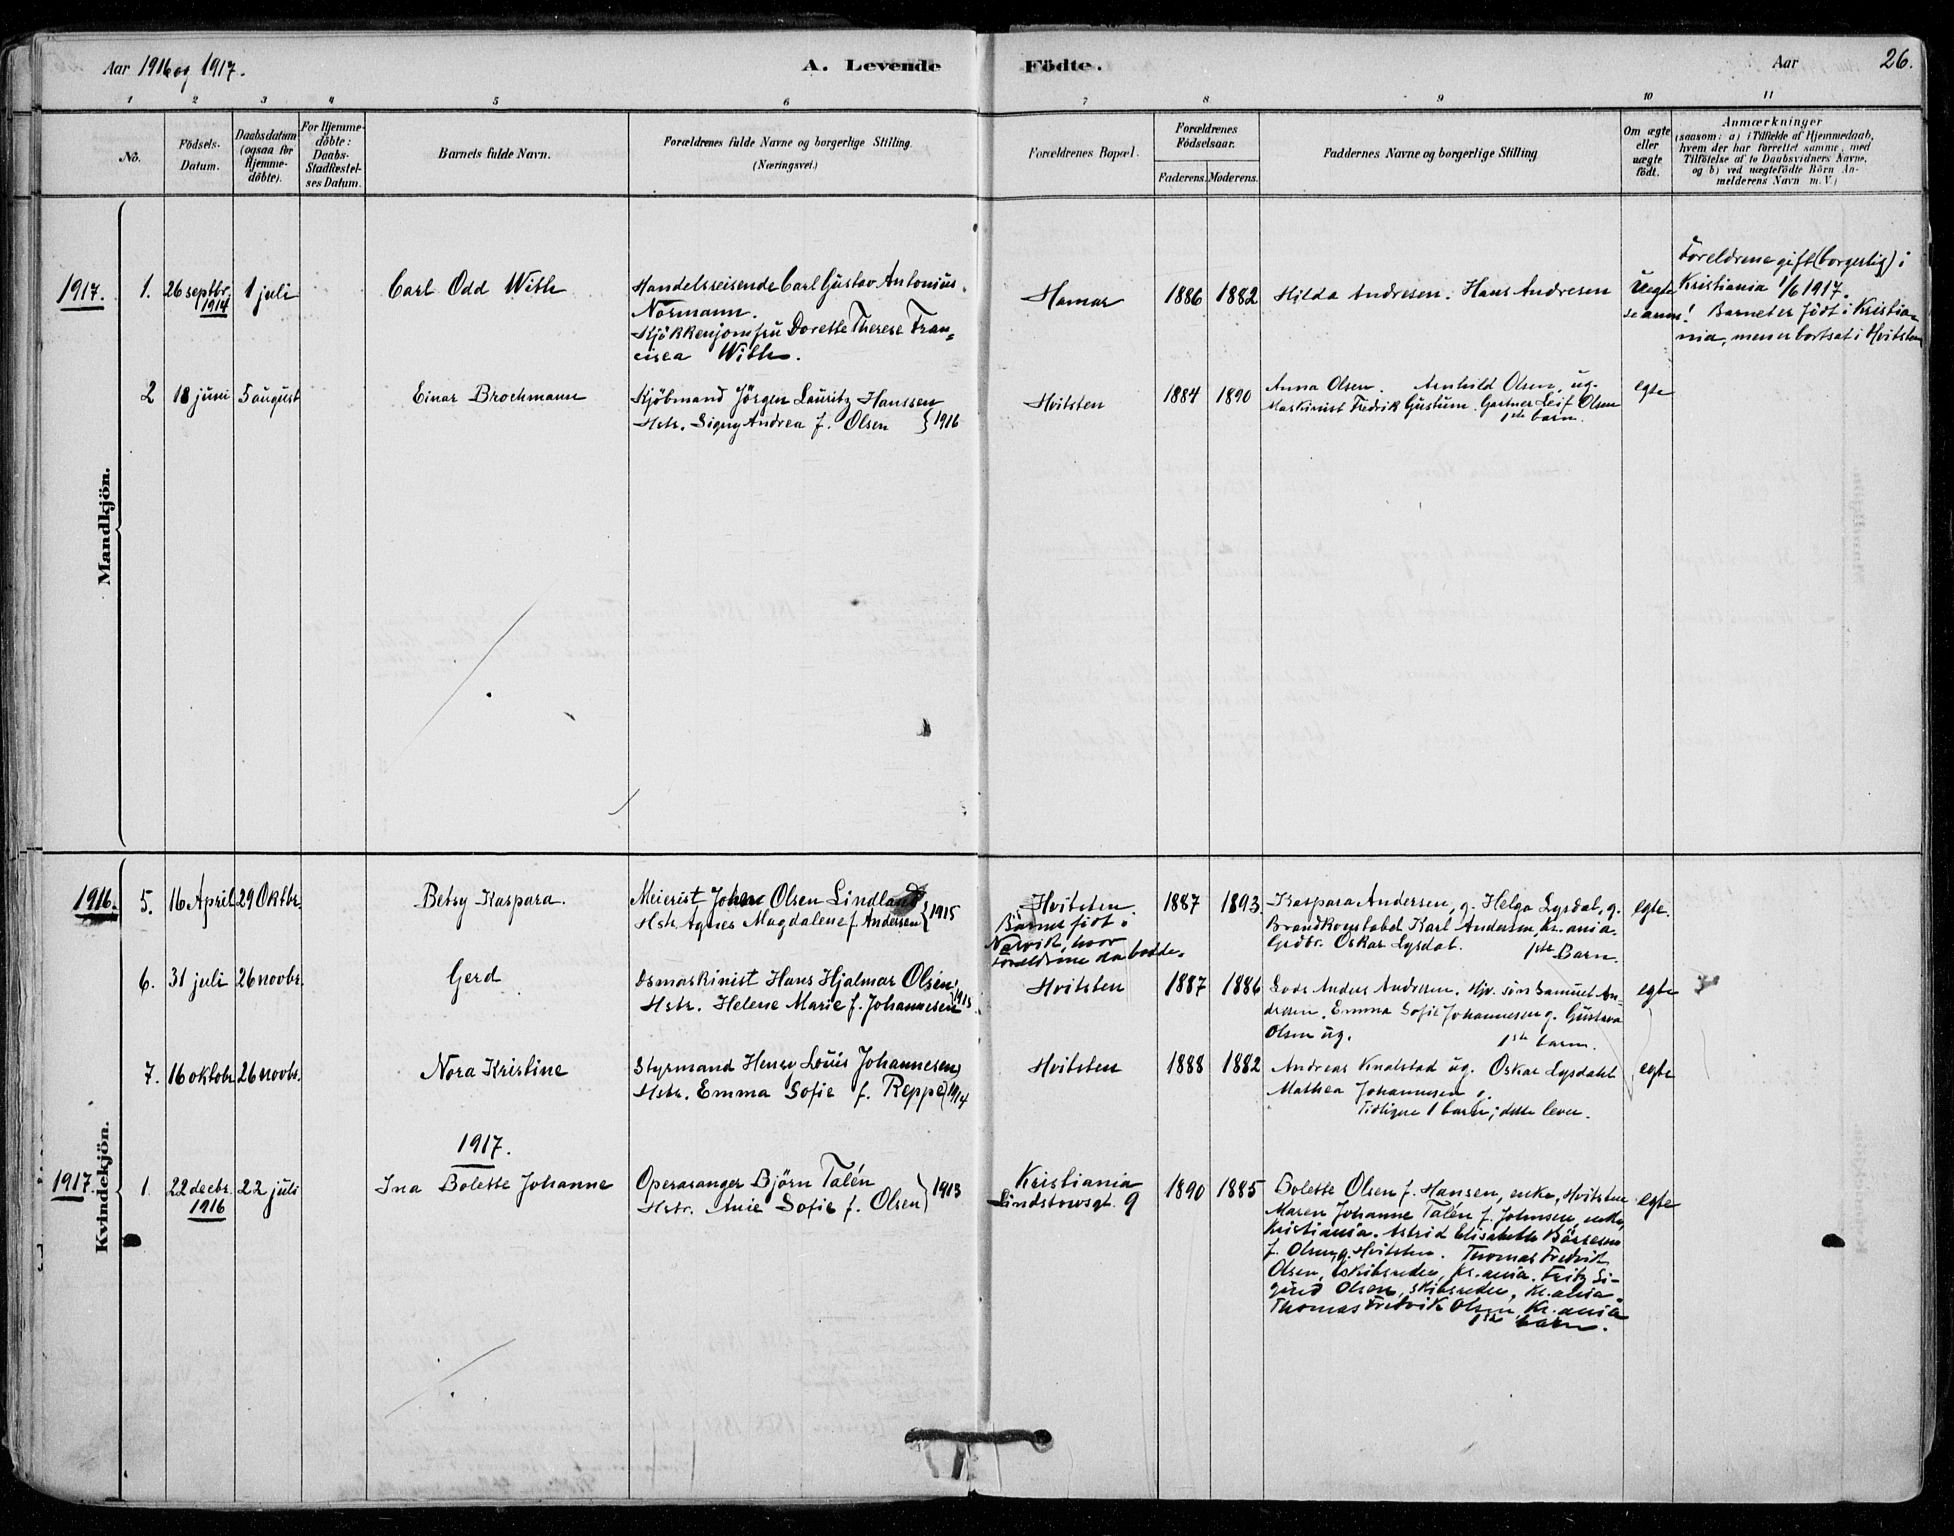 SAO, Vestby prestekontor Kirkebøker, F/Fd/L0001: Ministerialbok nr. IV 1, 1878-1945, s. 26